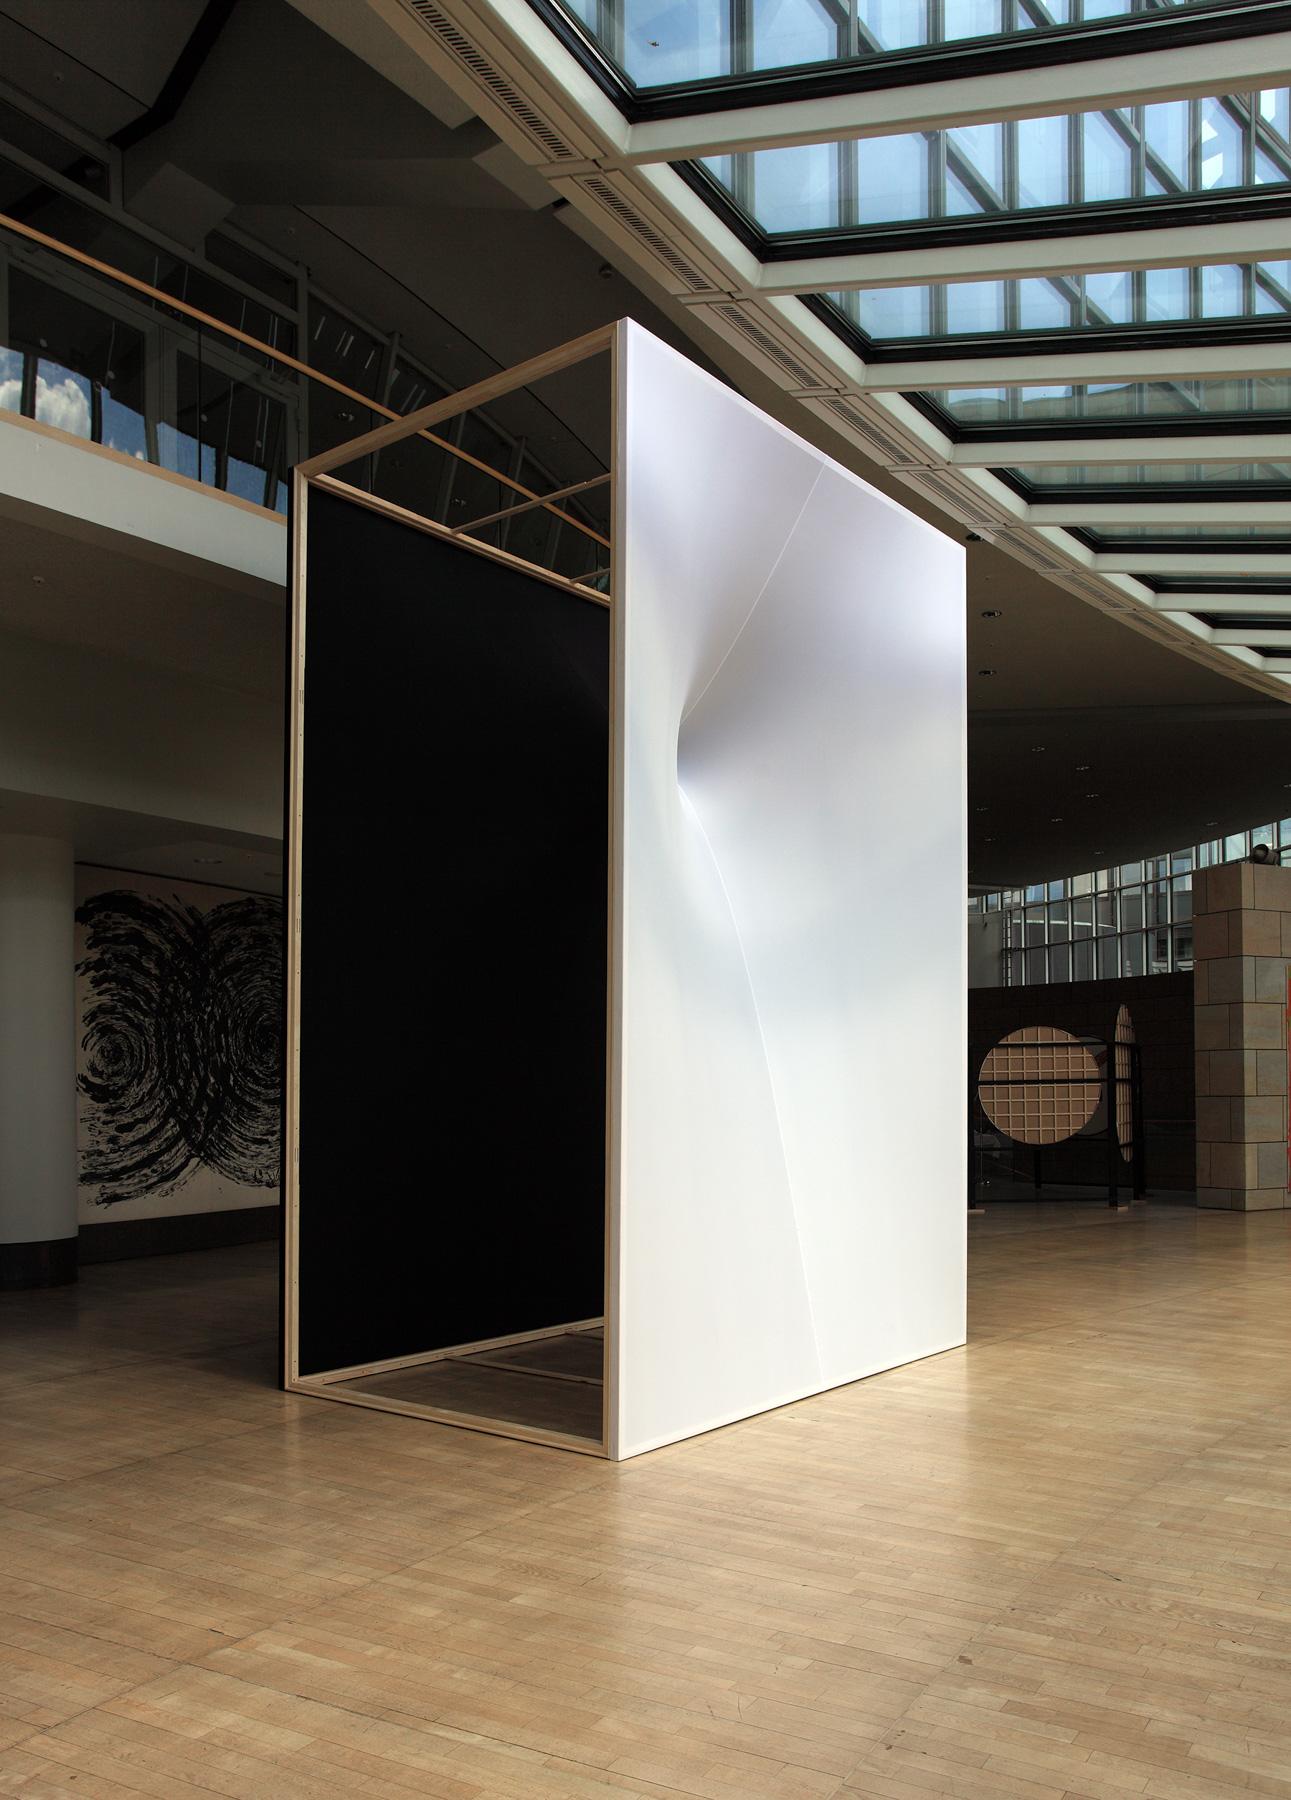 """JIBA SN"" 2014 Magnet, cloth, wood / 460 x 300 x 200cm Nordrhein-Westfalen, NRW Landtag, Düsseldorf, Germany"